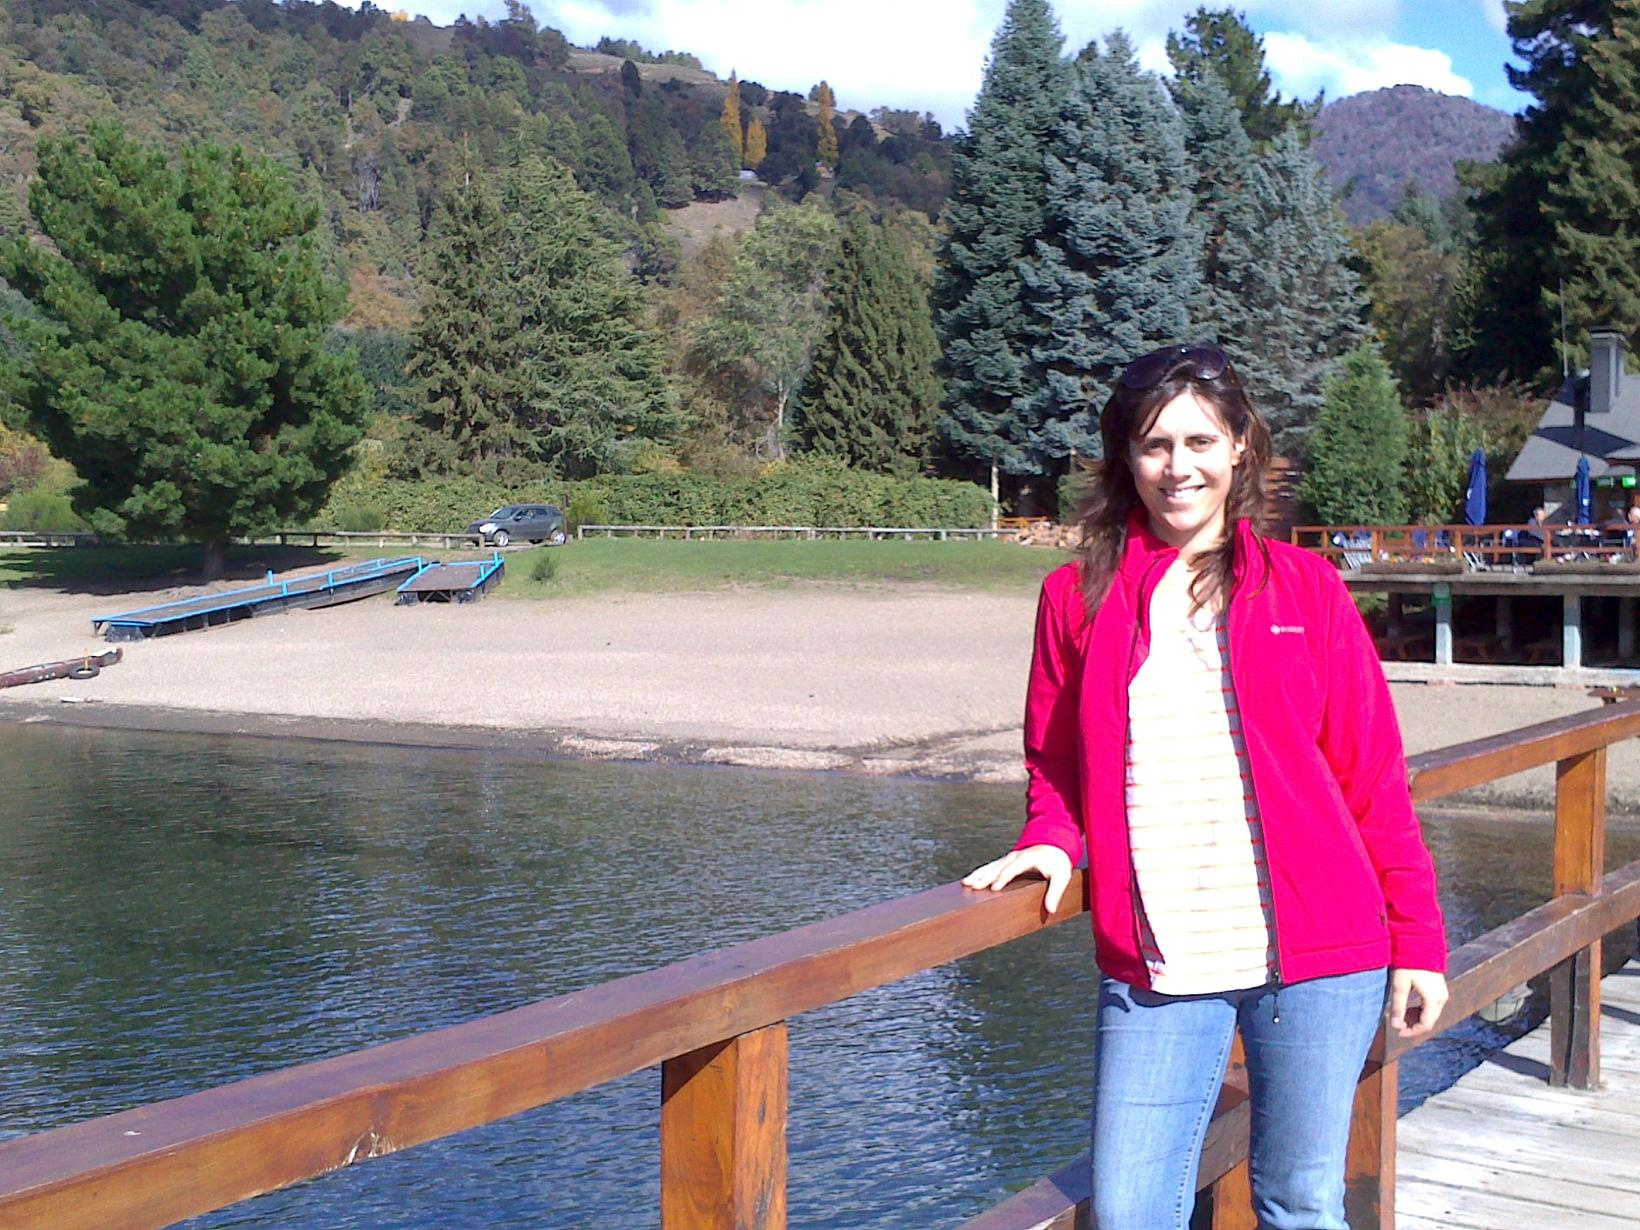 Gloria cecilia from Neuquén, Argentina